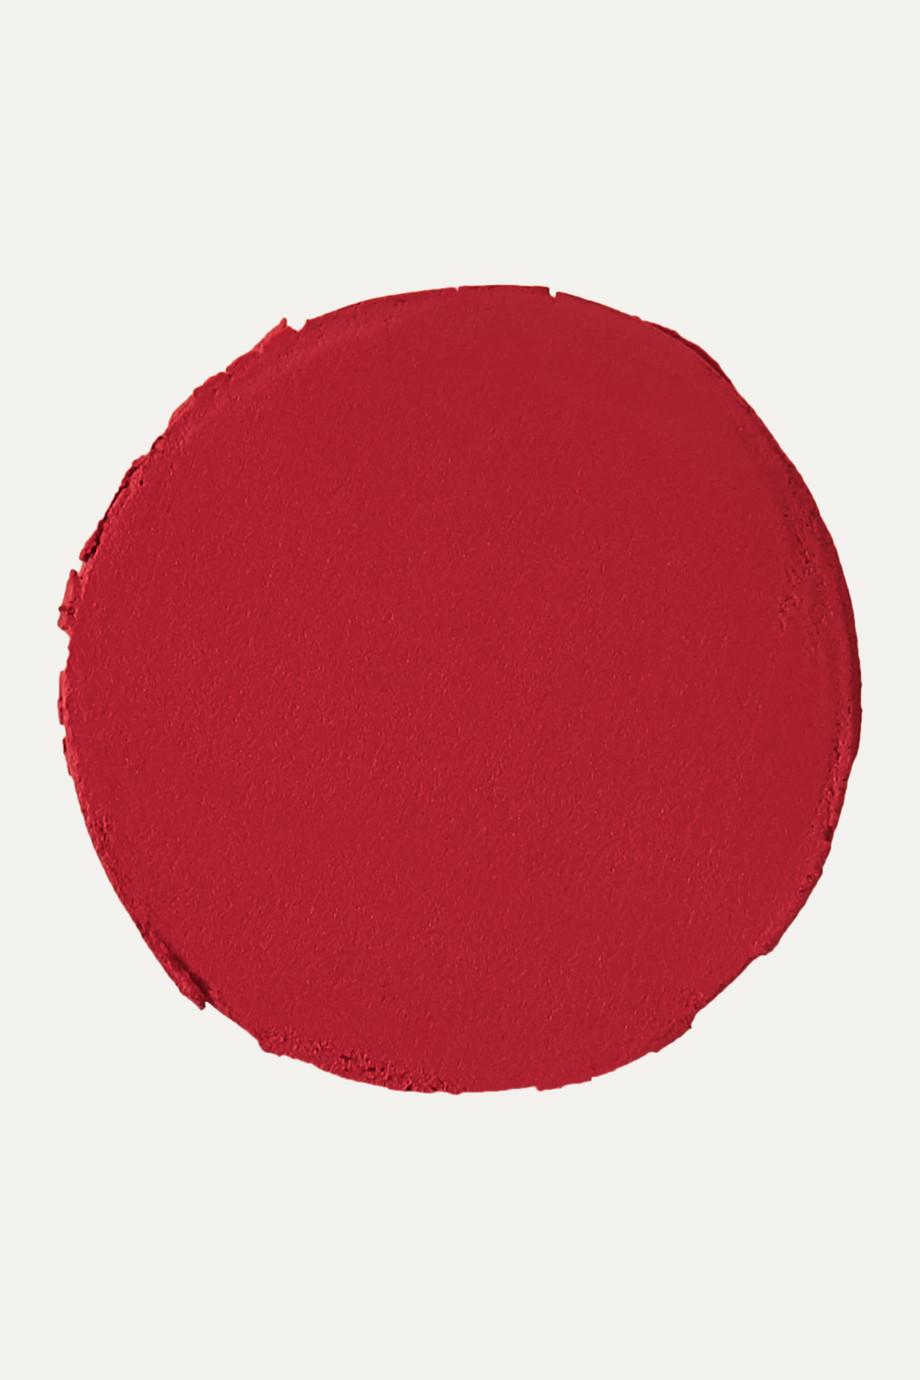 Shiseido ModernMatte Powder Lipstick – Sling Back – Lippenstift